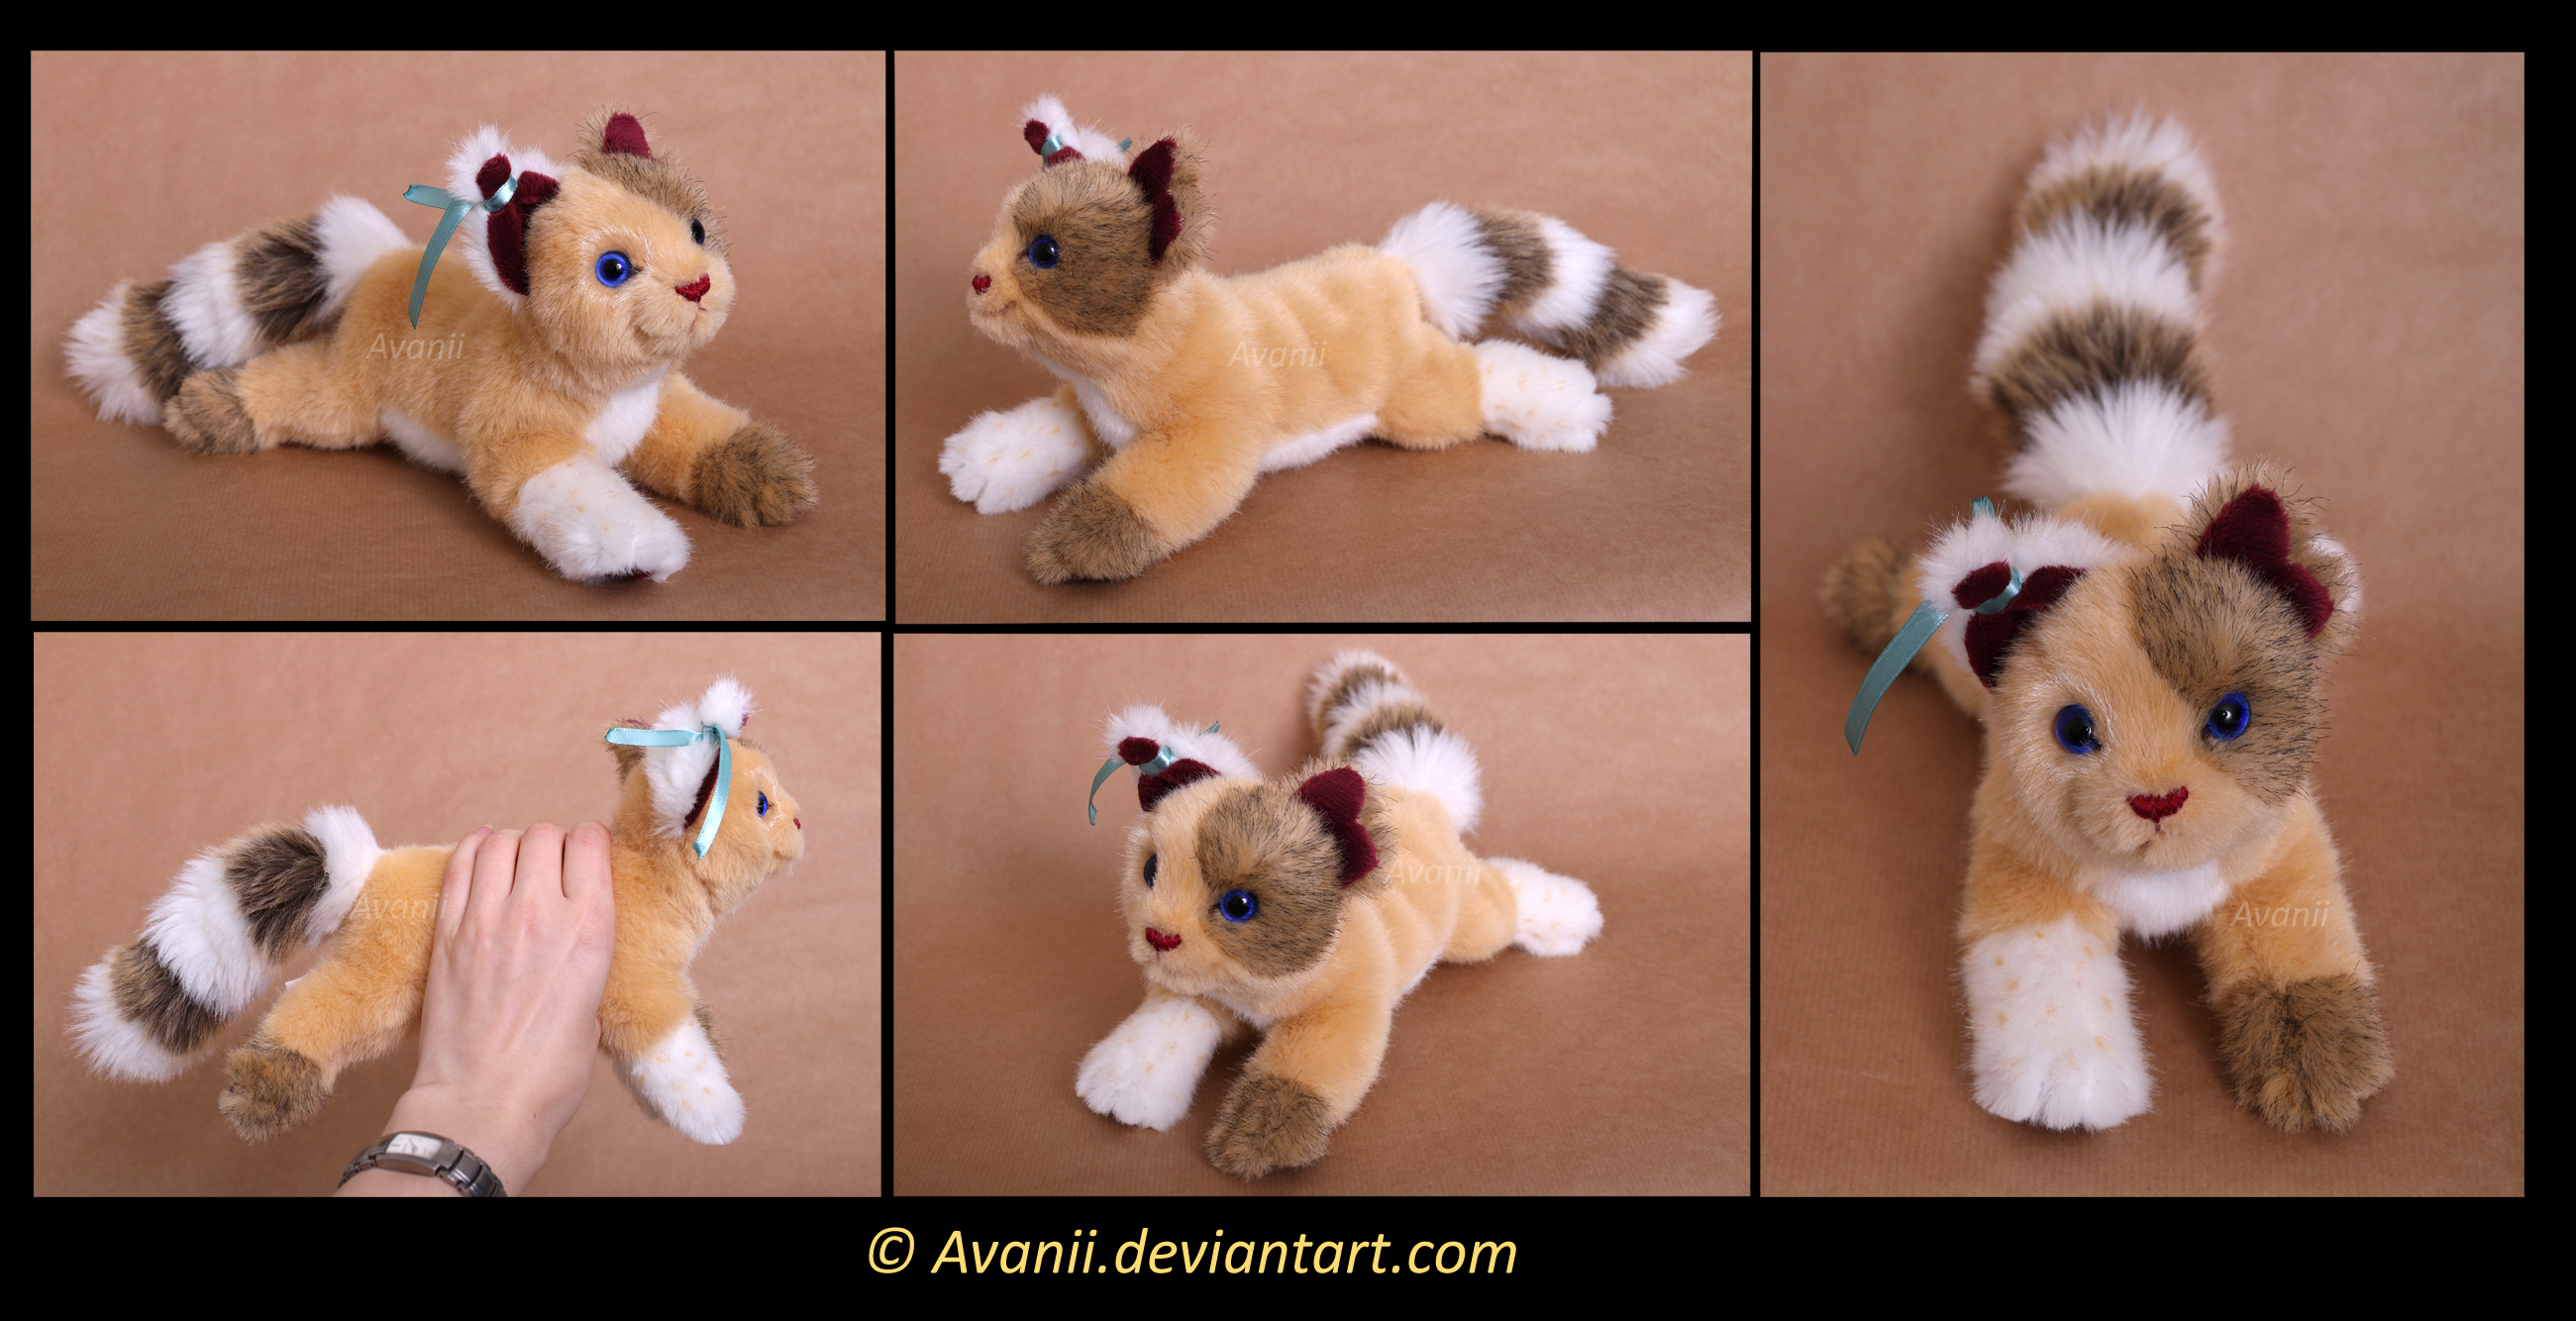 Plushie Commission: Dragonblaze the Cat by Avanii